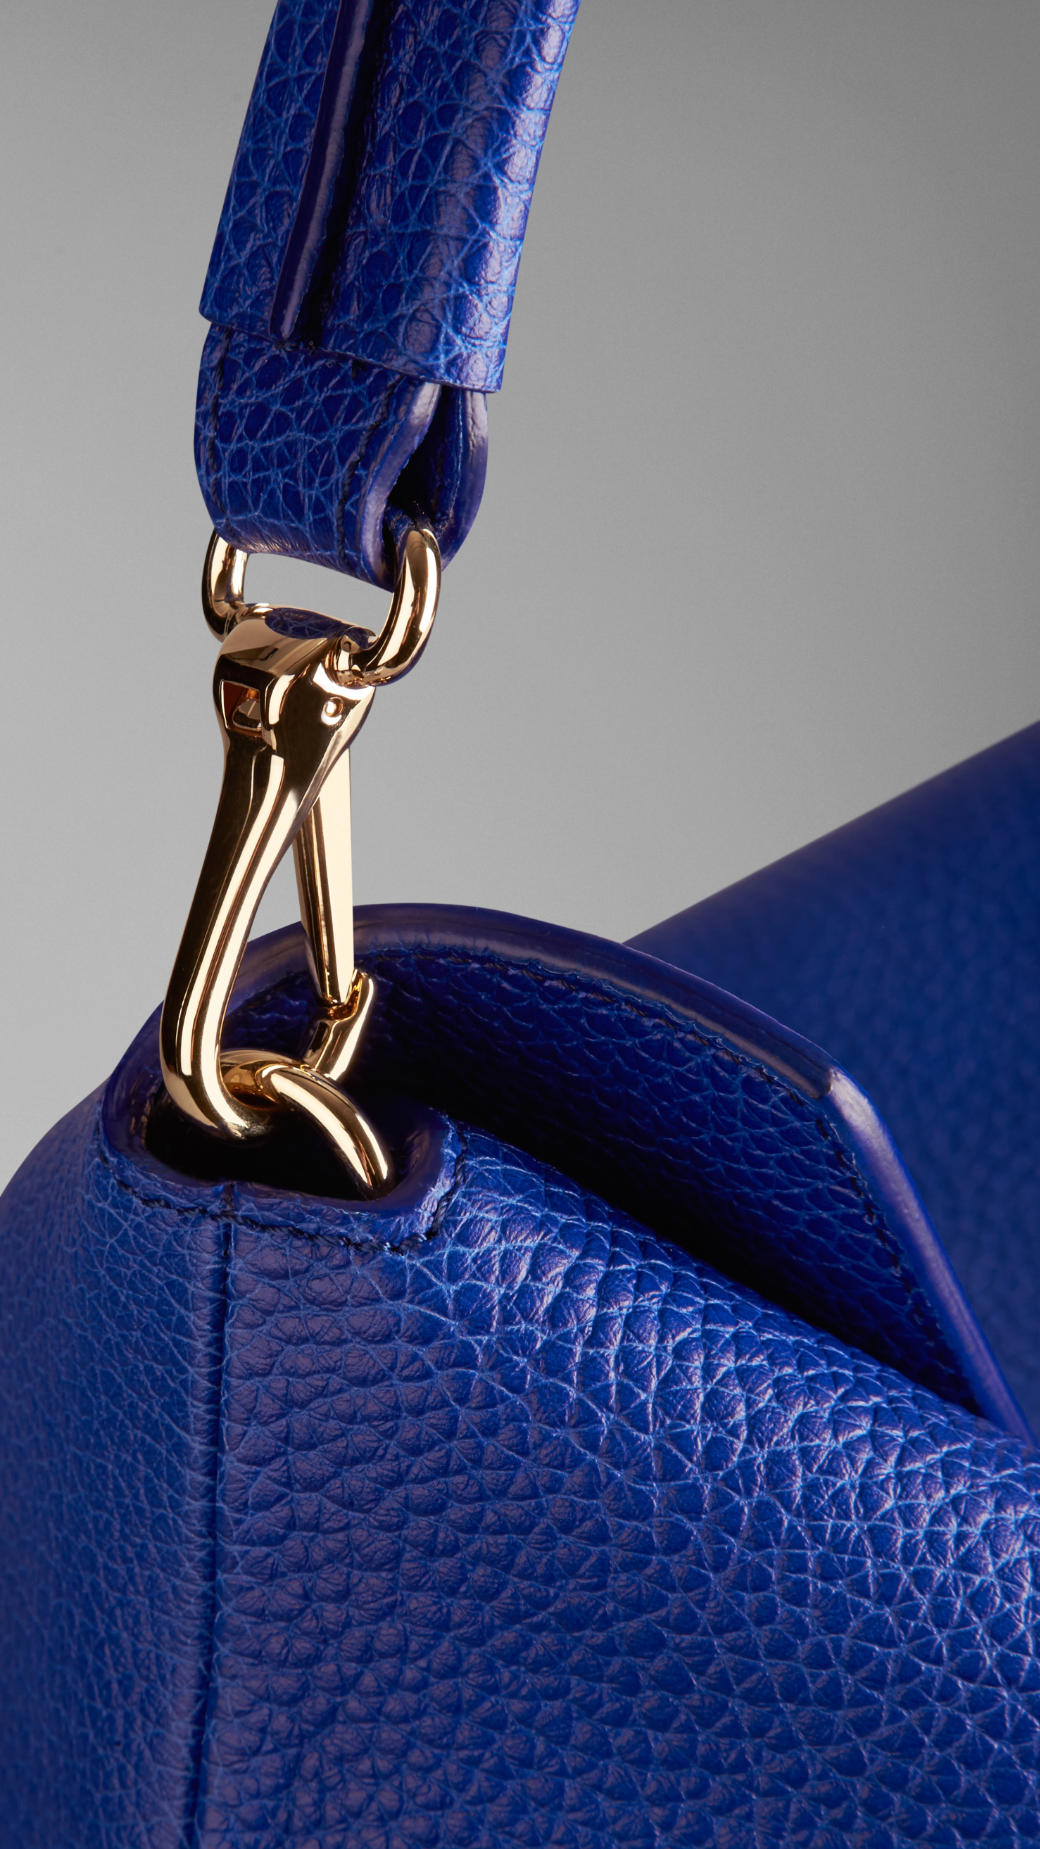 Lyst - Burberry Medium Leather Hobo Bag in Blue 49aaaa65178e3